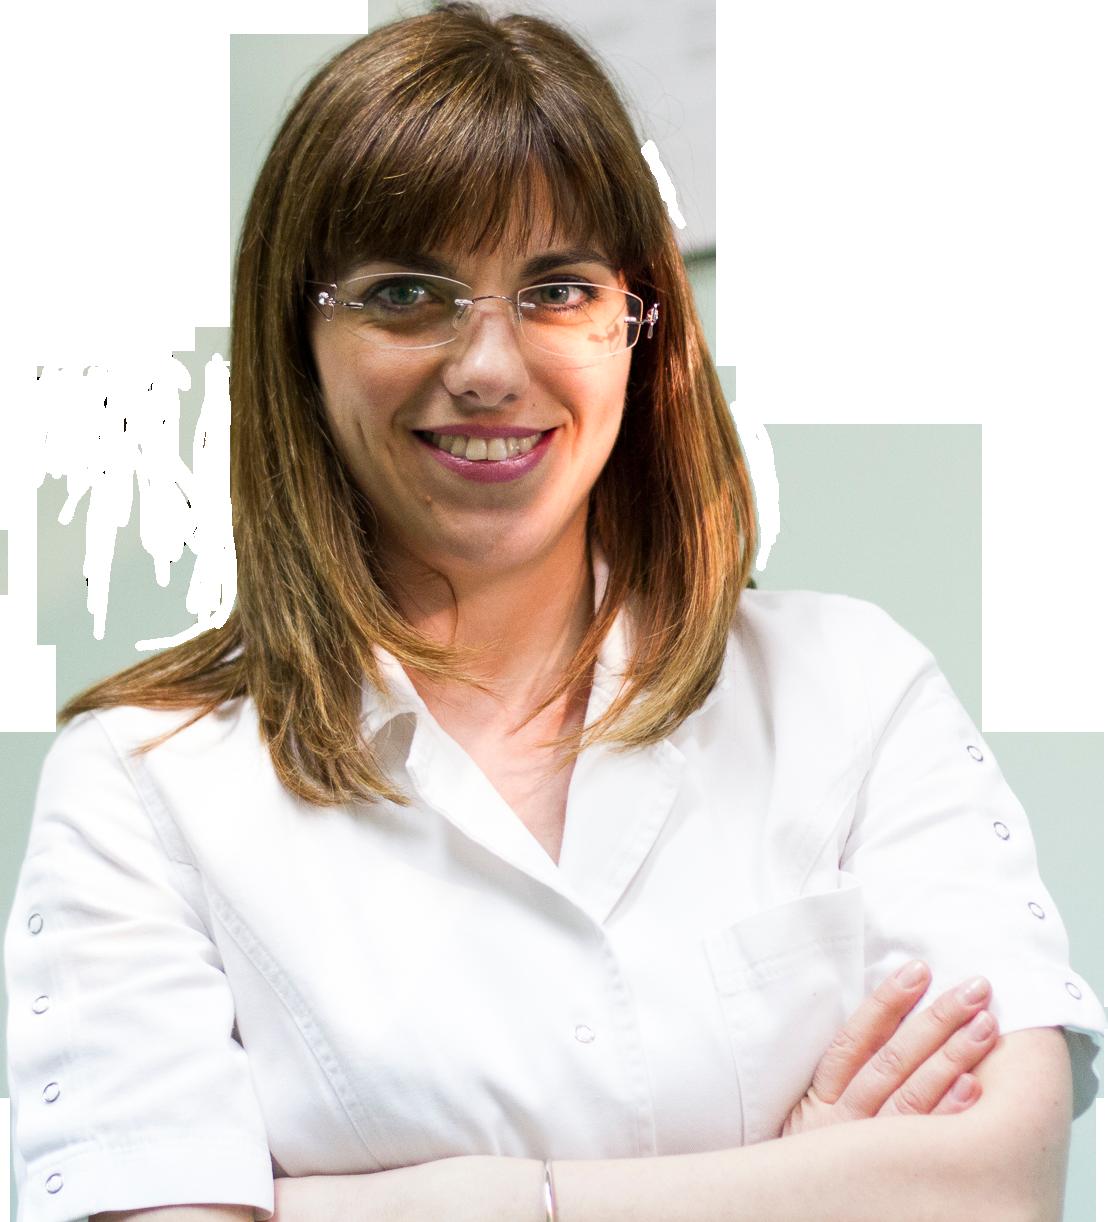 http://ortodoncijadrandjelka.com/wp-content/uploads/2017/12/Ortodoncija-dr-Andjelka-1.png